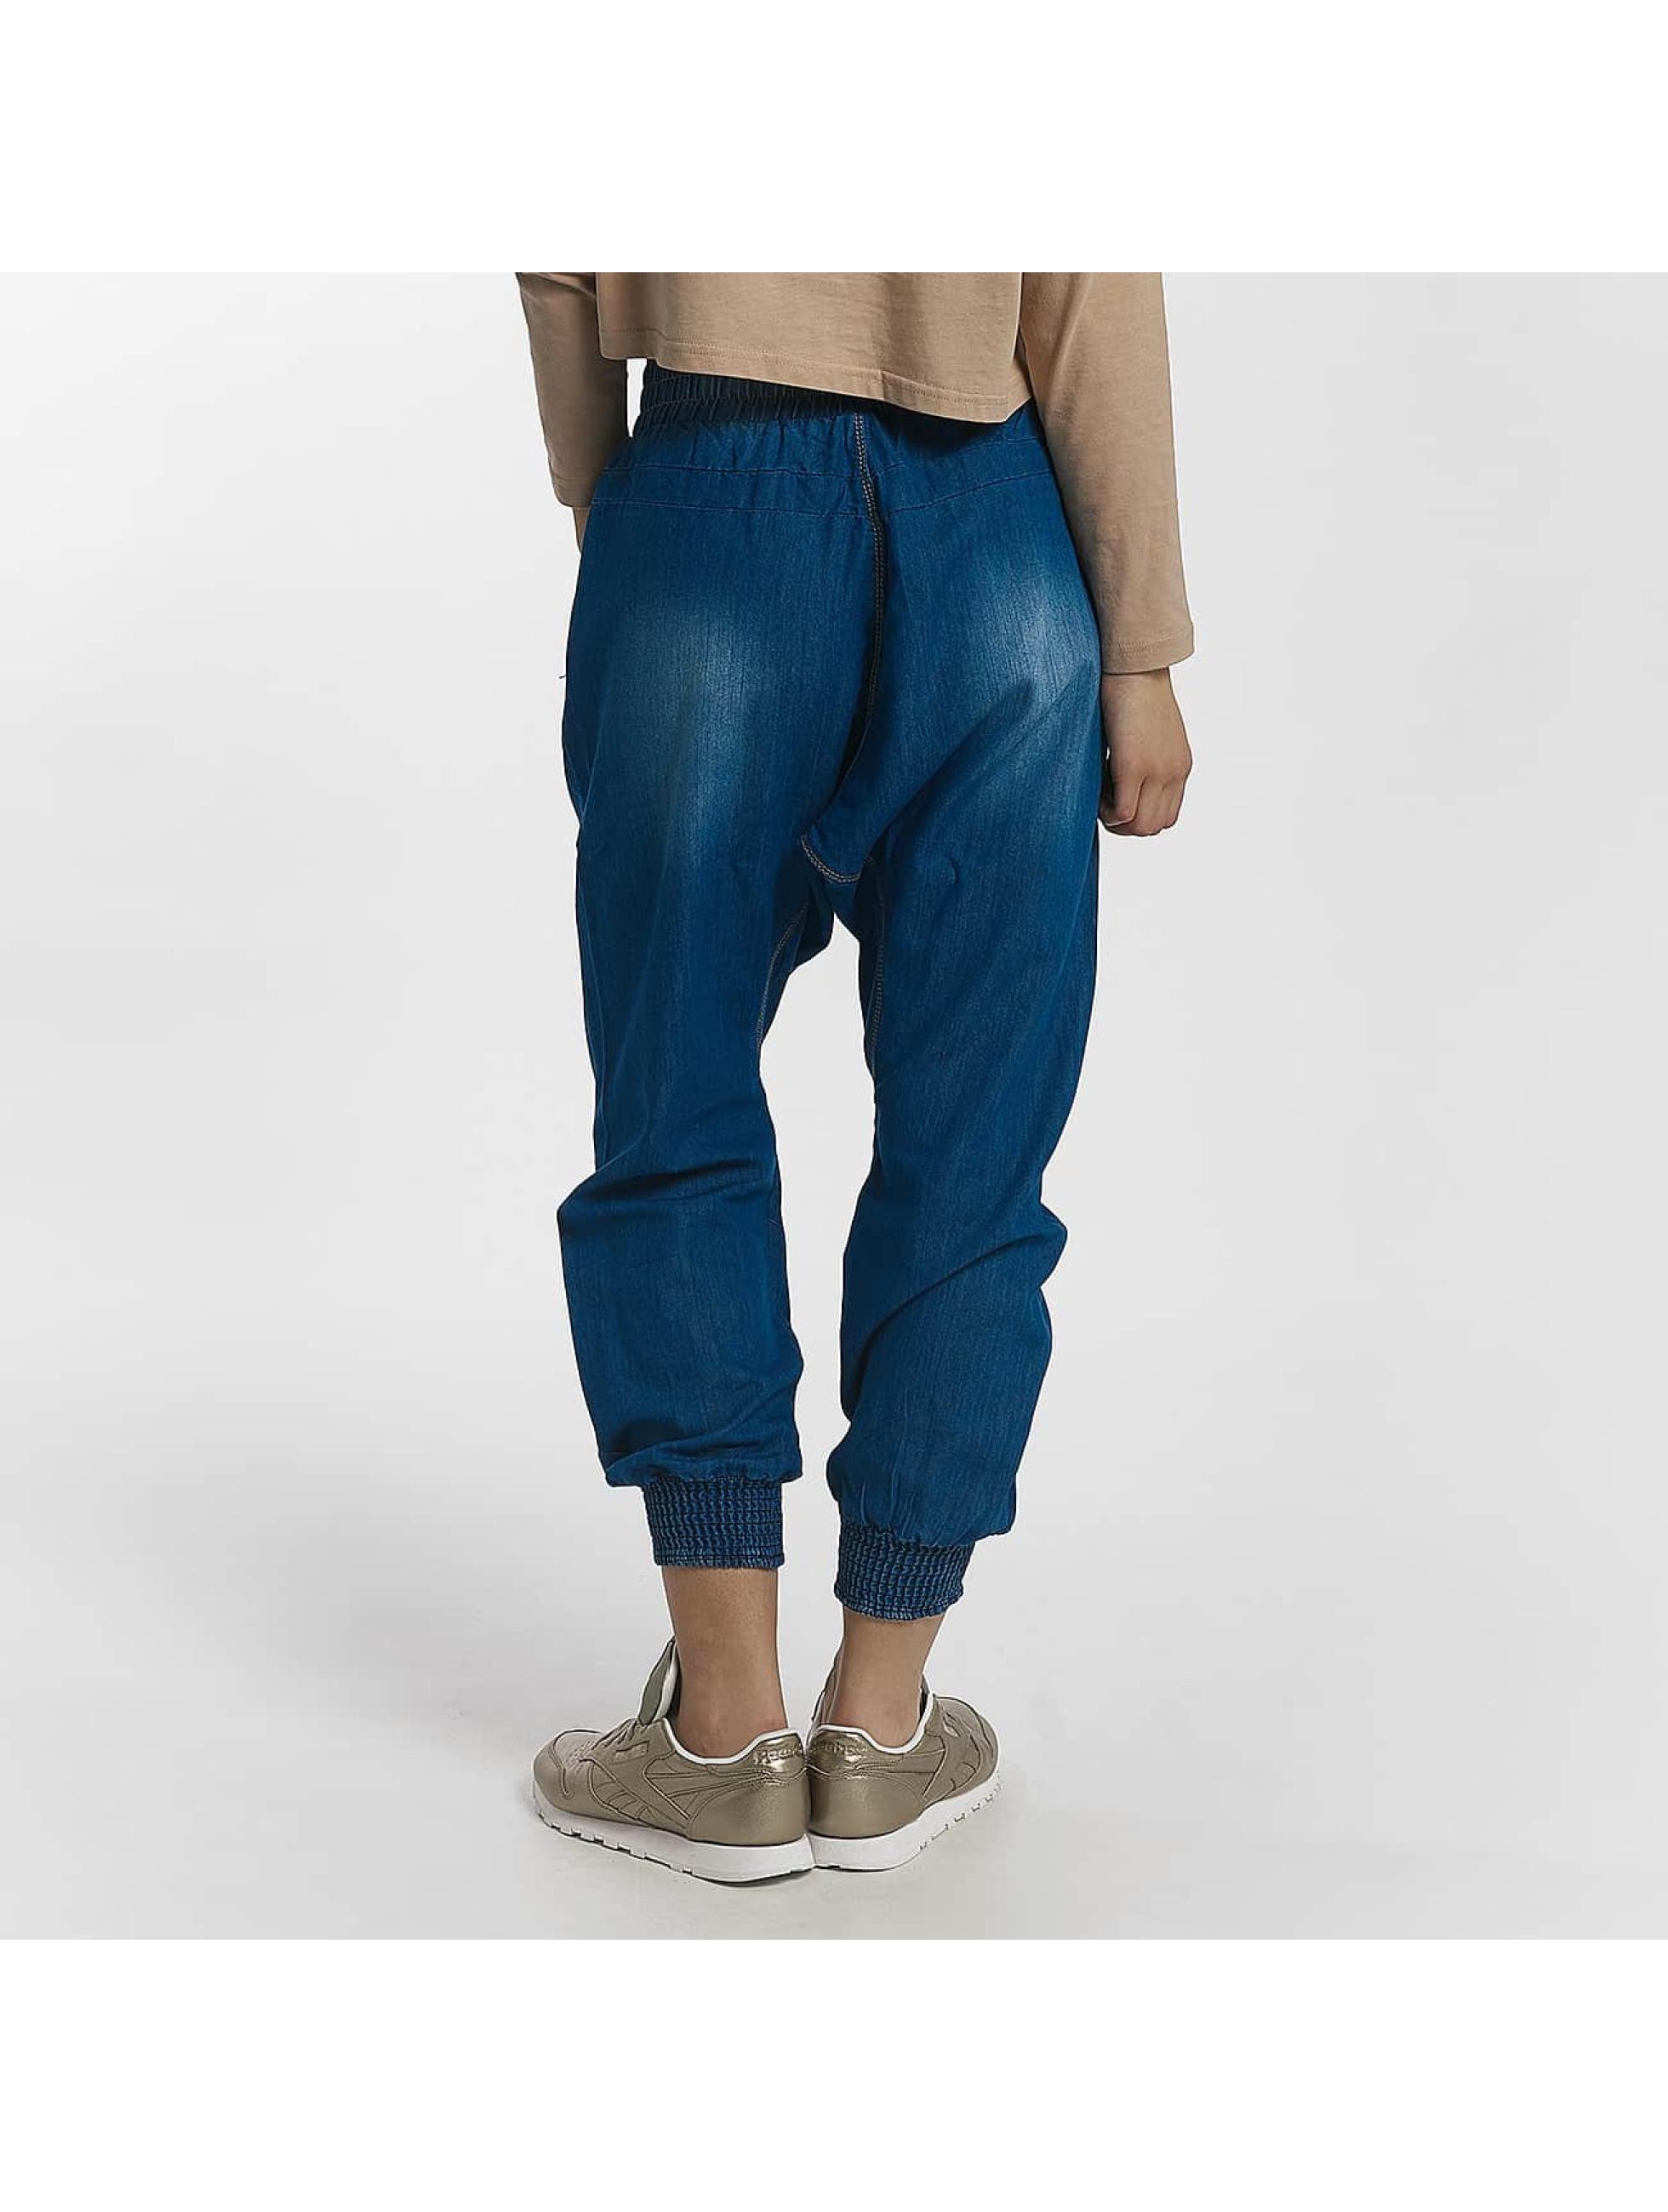 Leg Kings Antifit MissTwo blau